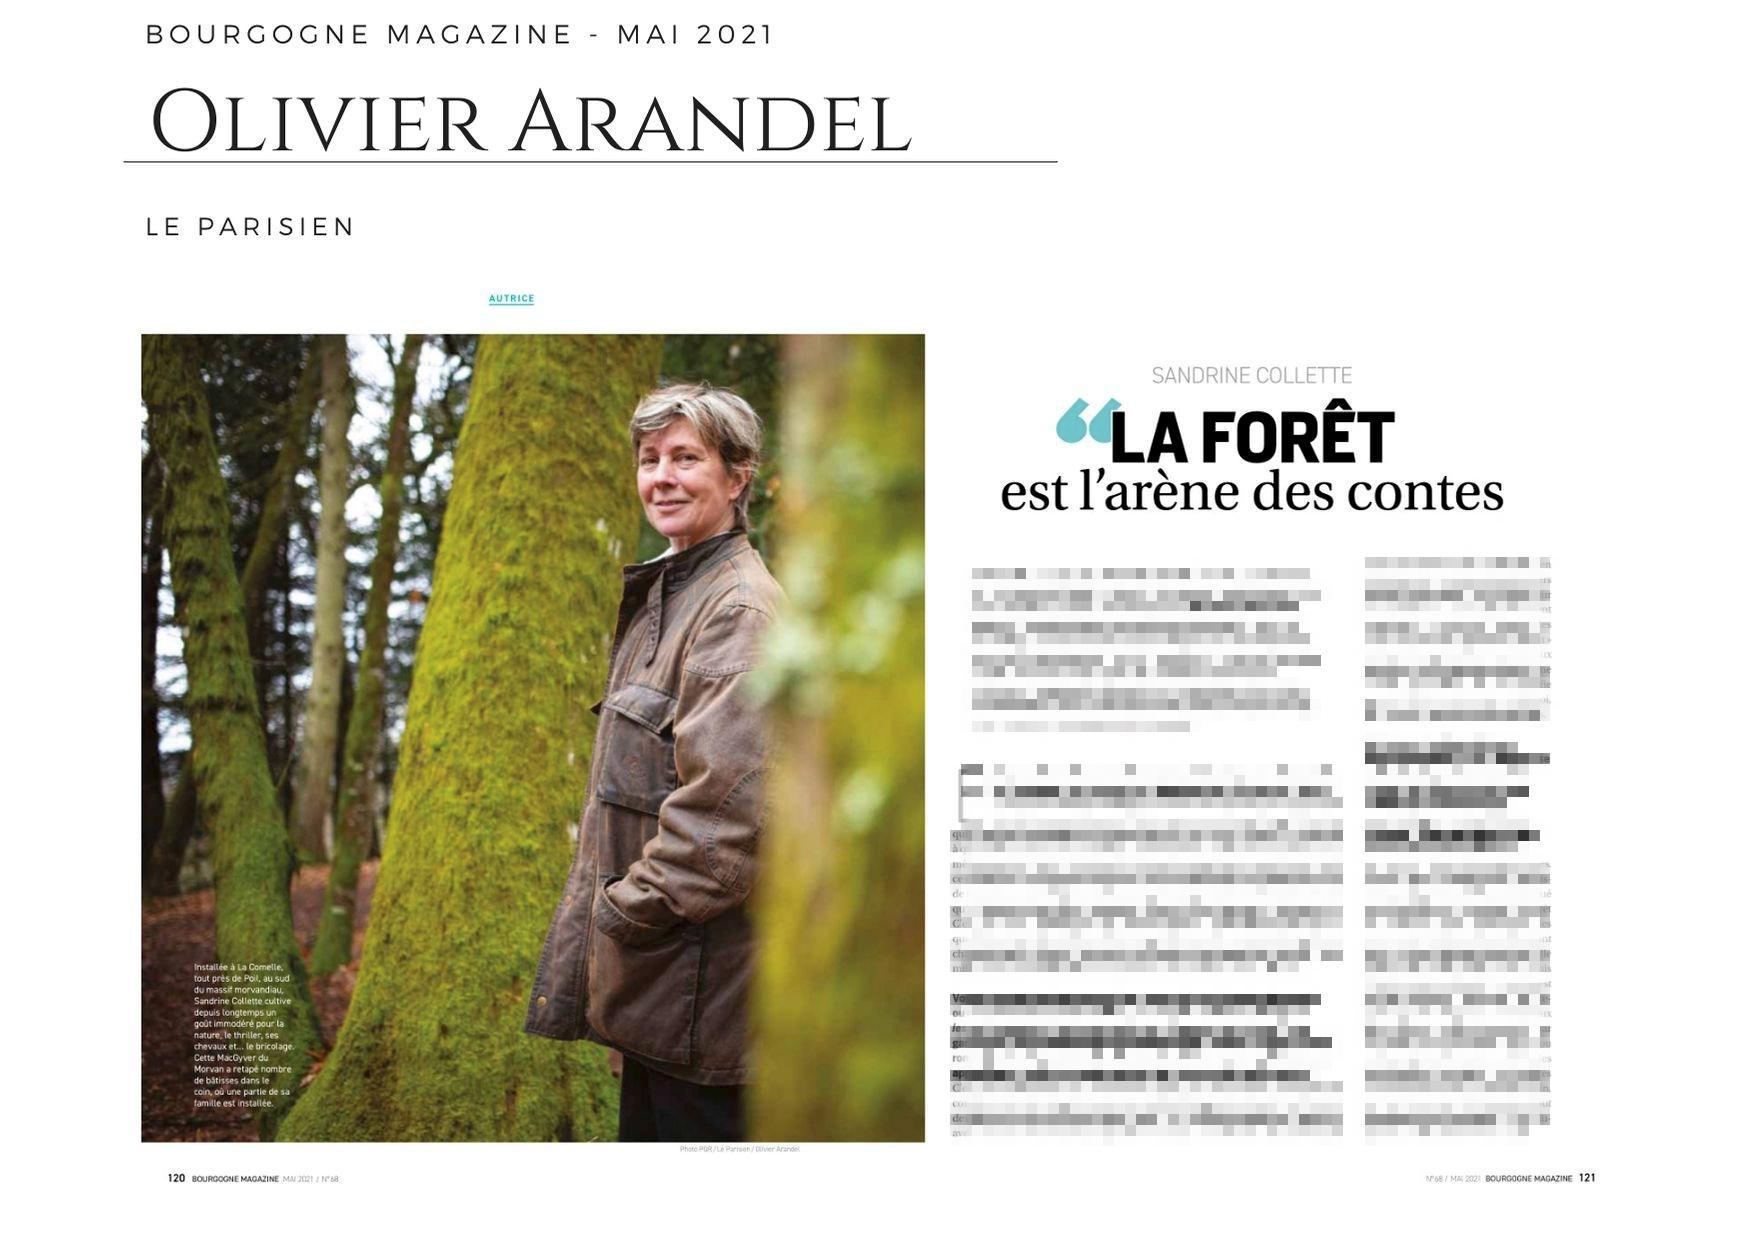 Bourgogne Magazine - Mai 2021